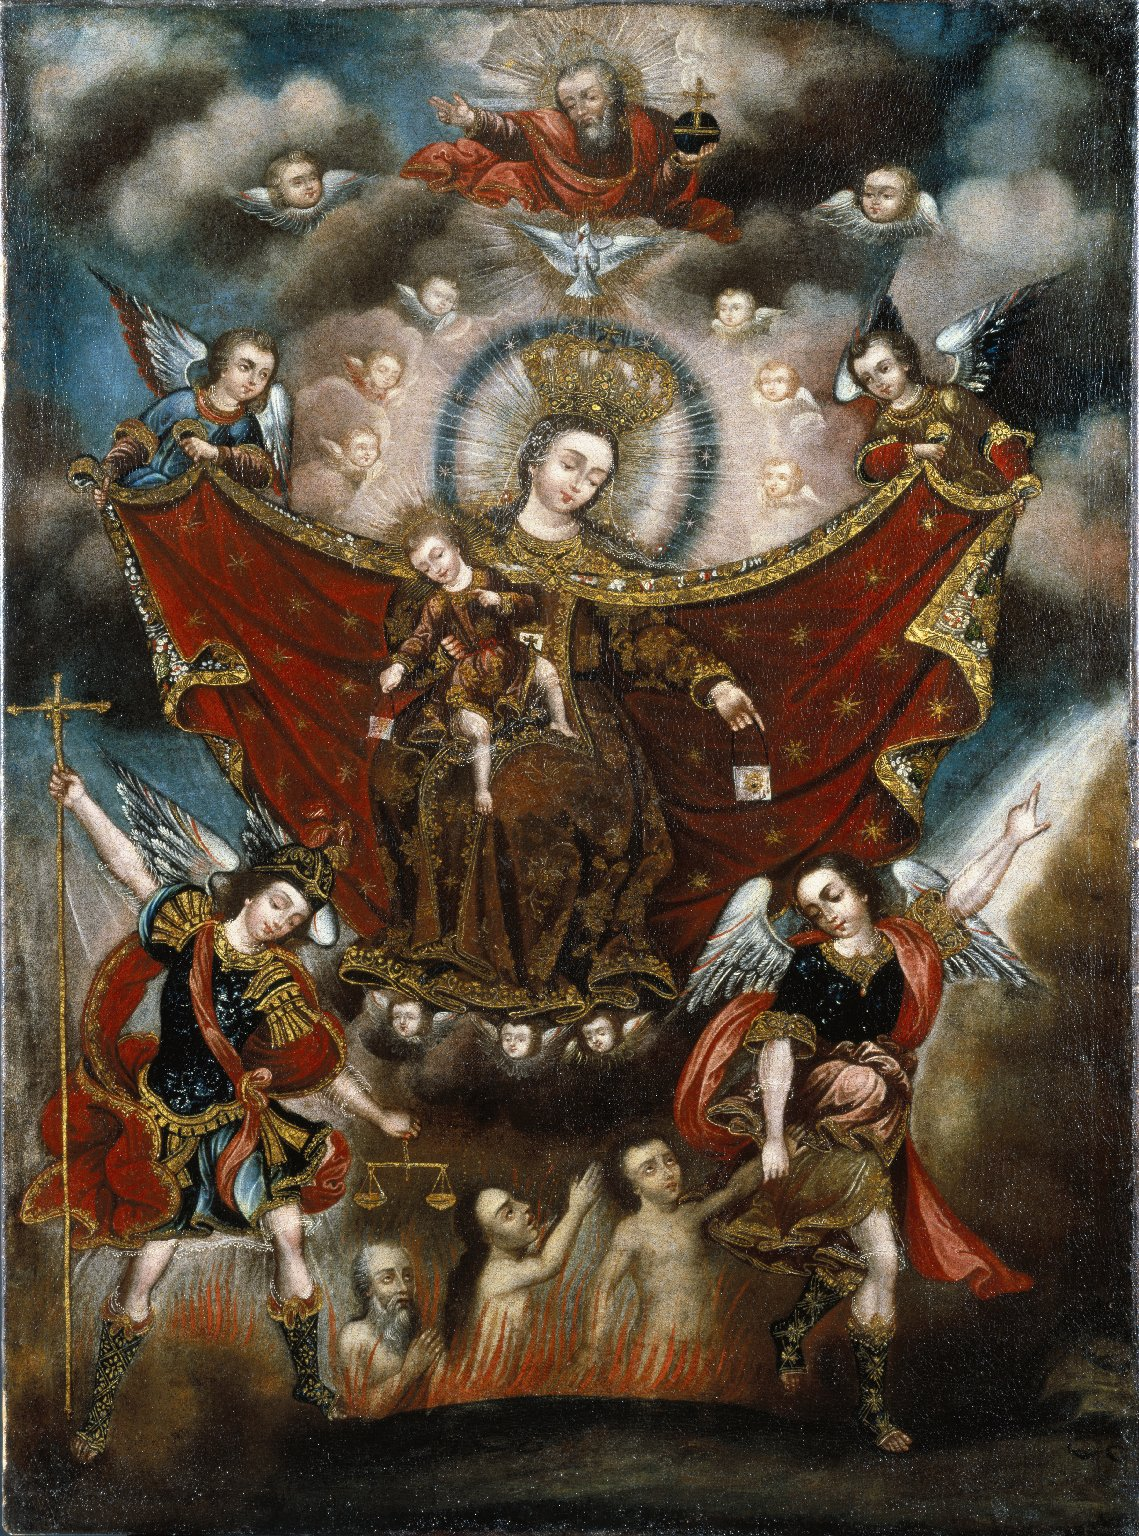 Virgin of Carmel Saving Souls in Purgatory, by Cusco School, c. 17th century. Brooklyn Museum, New York, New York, United States. Via IllustratedPrayer.com